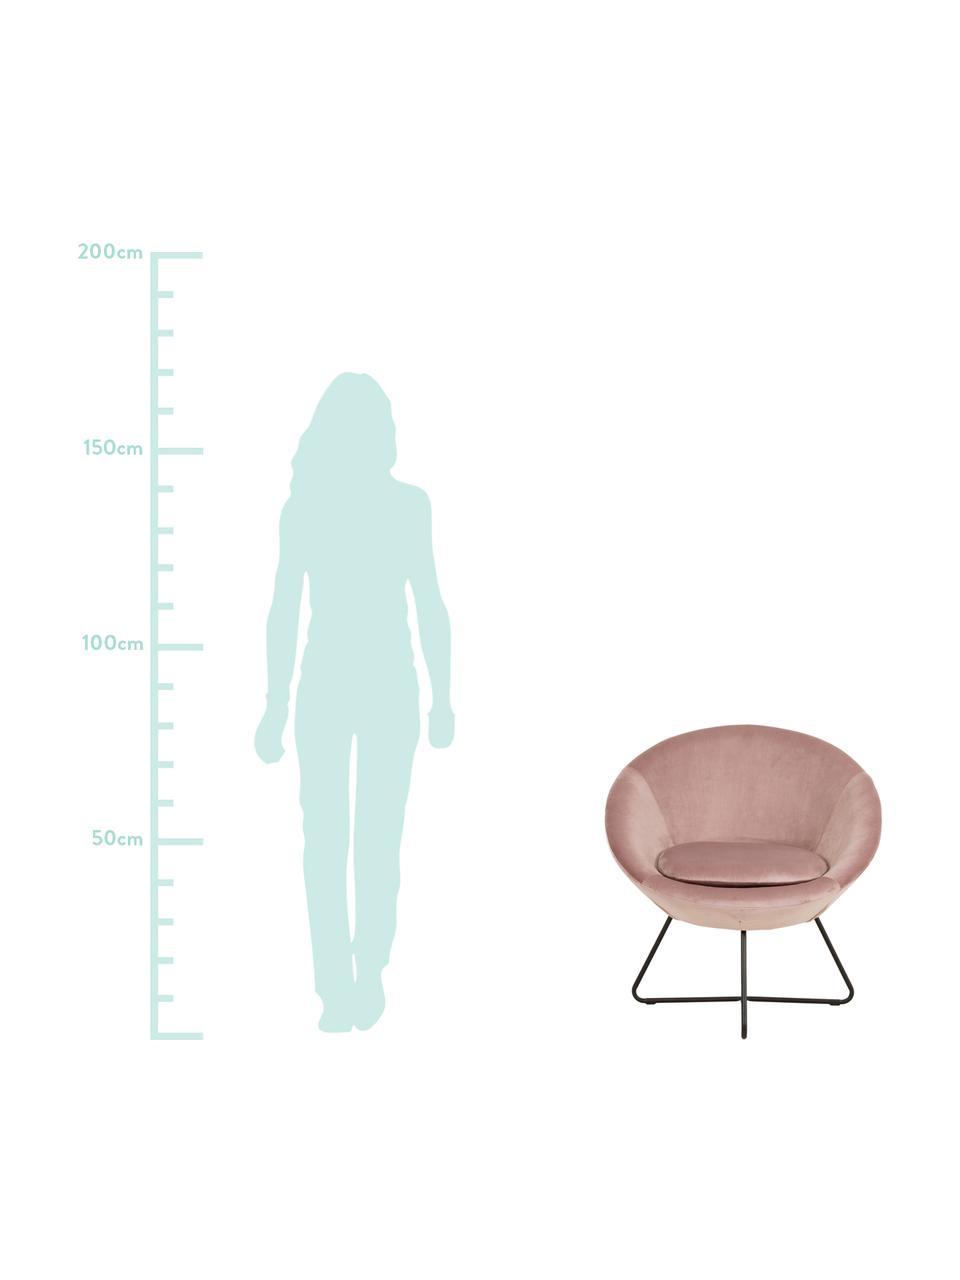 Fluwelen fauteuil Center in oudroze, Bekleding: polyester fluweel, Poten: metaal, ruw poedercoating, Fluweel oudroze, B 82 x D 71 cm